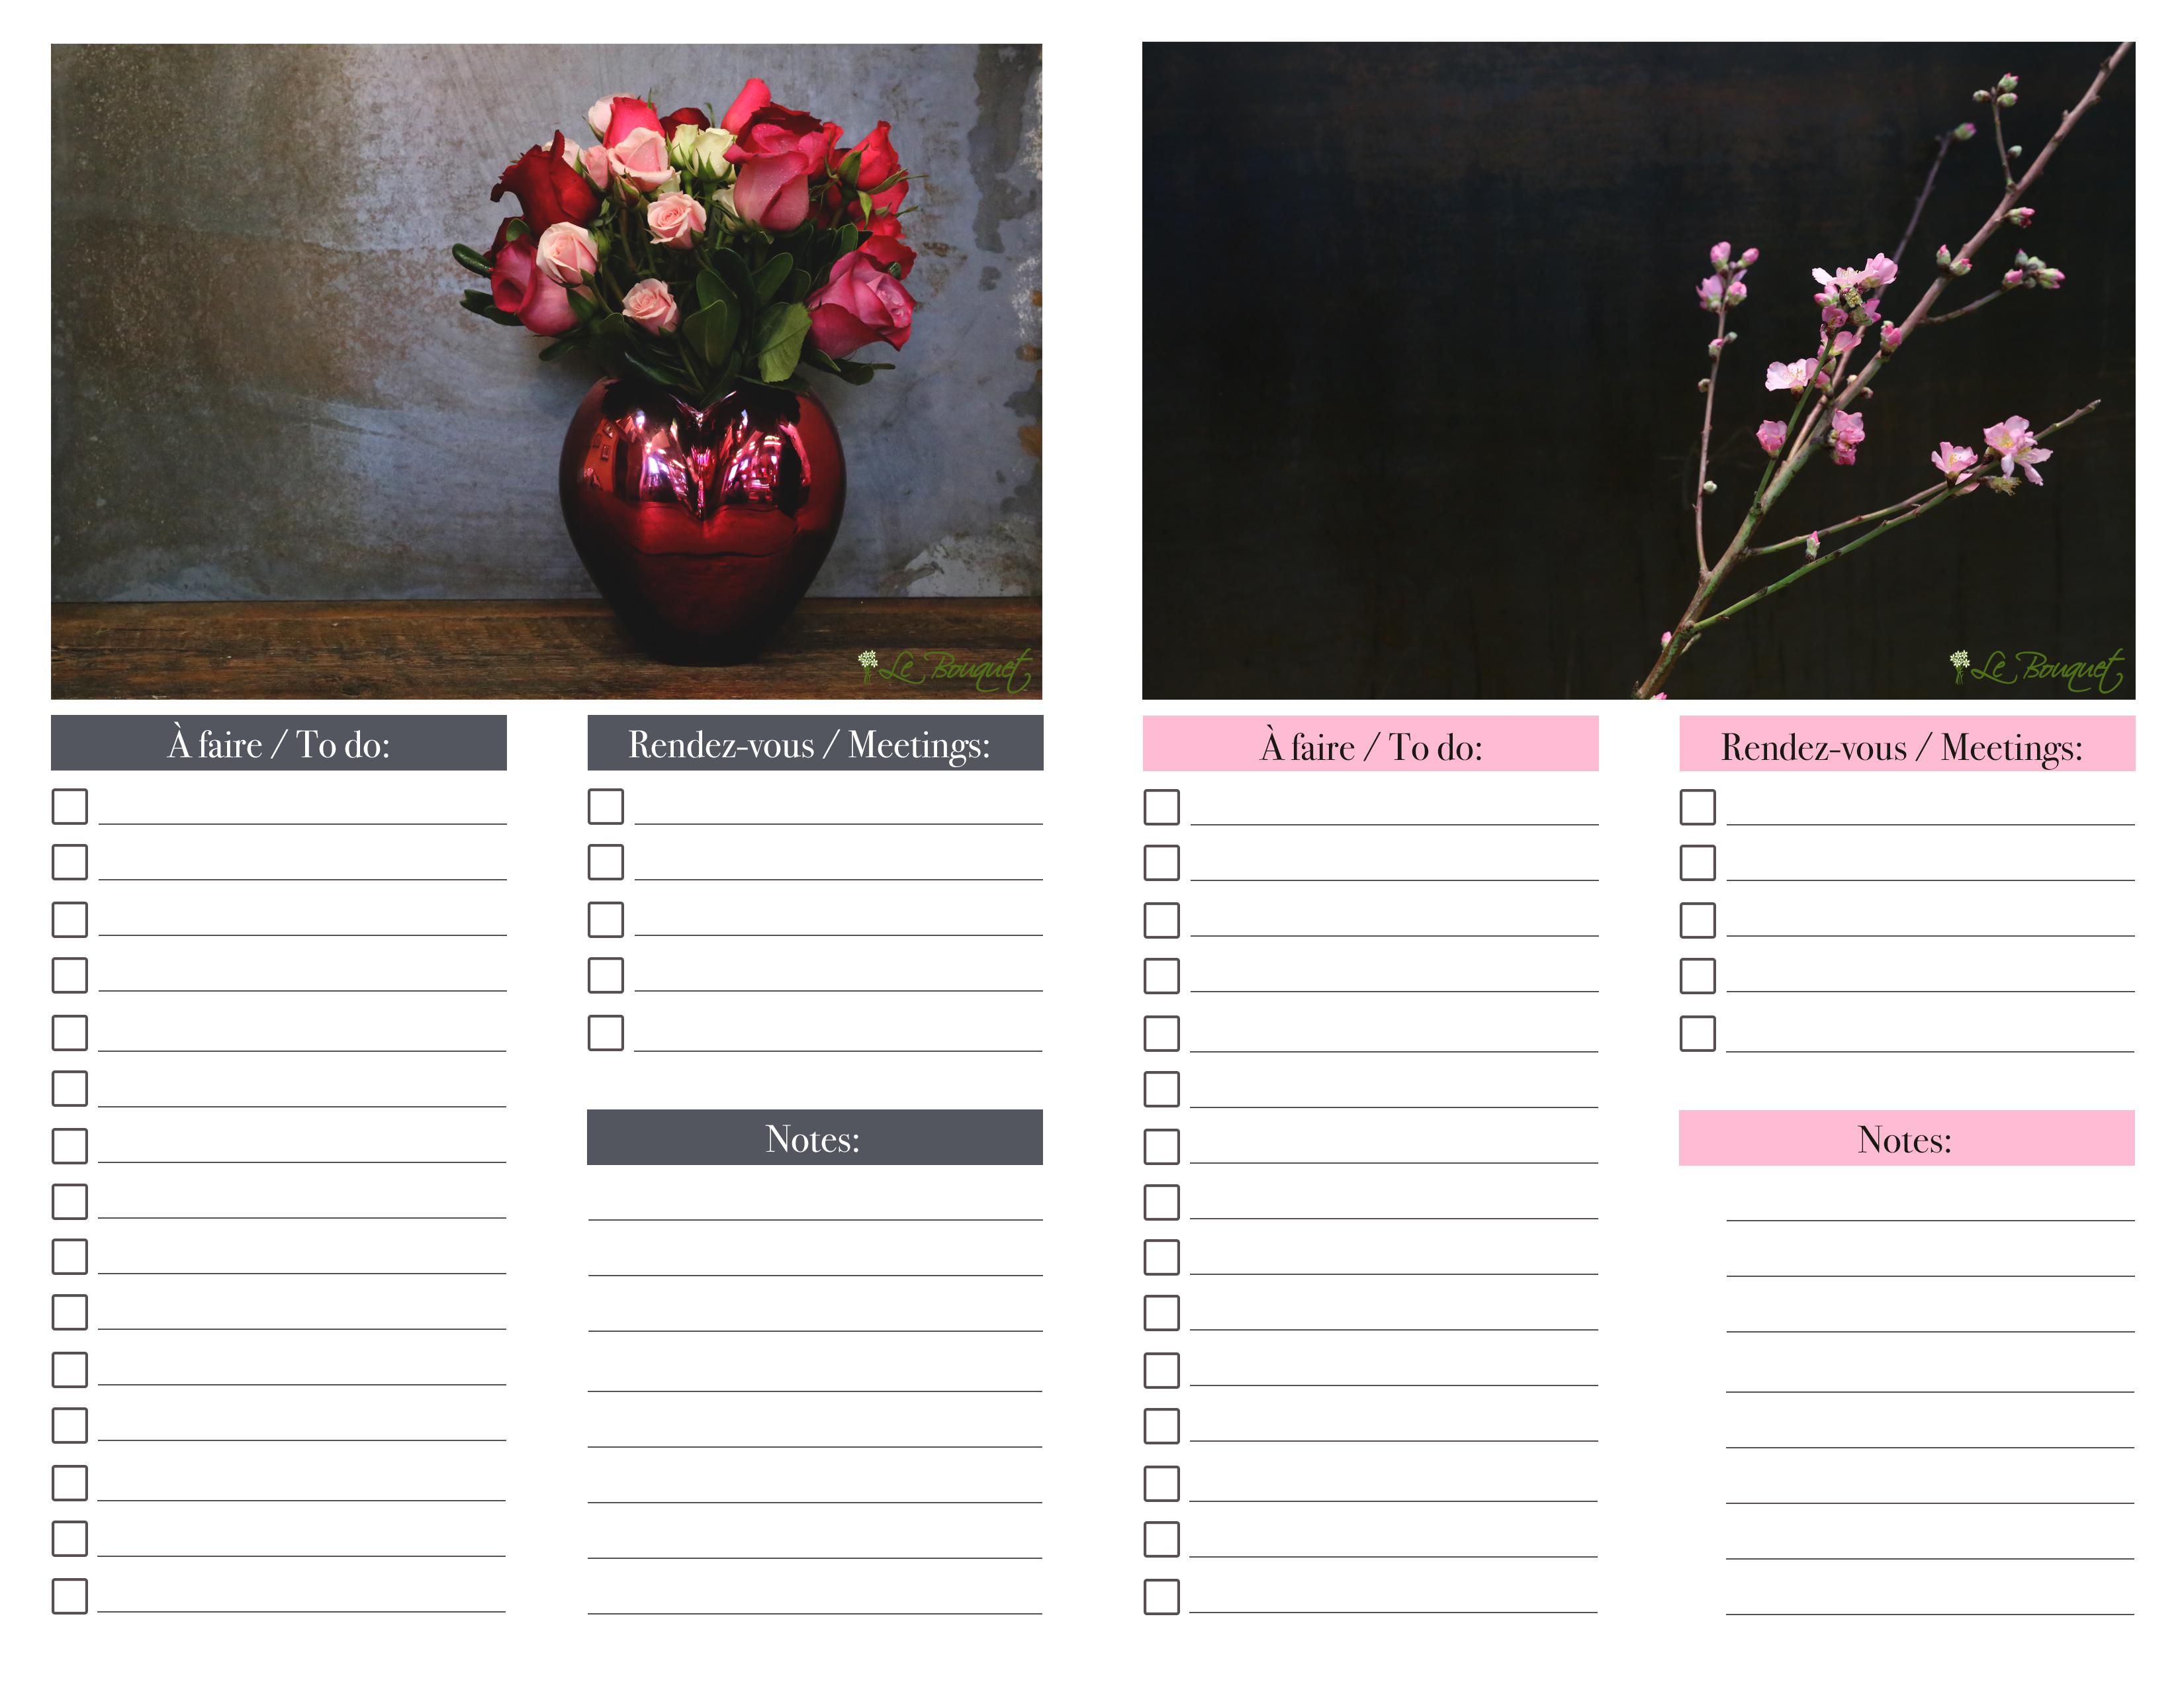 printable daily organizer - Agenda quotidien imprimable - rose